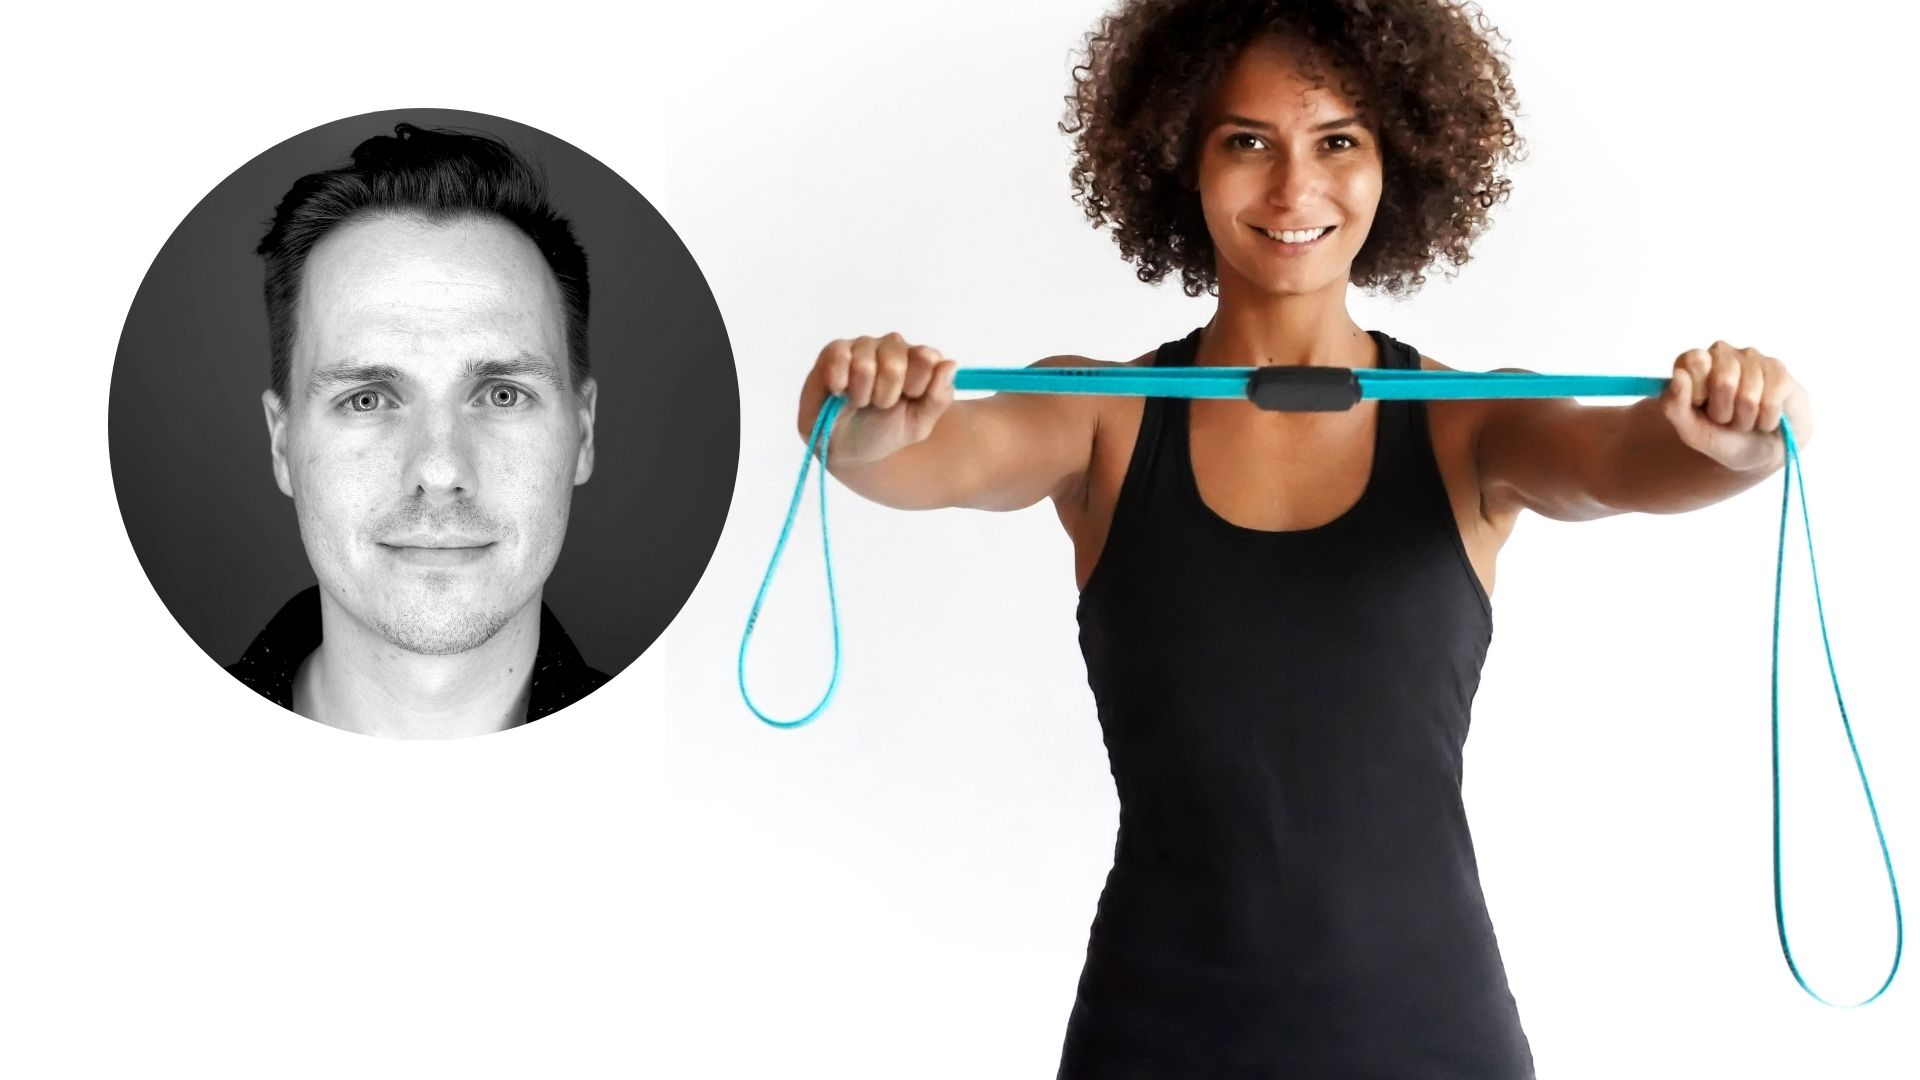 STRAFFR-Gründer will Fitness-Tools smarter machen